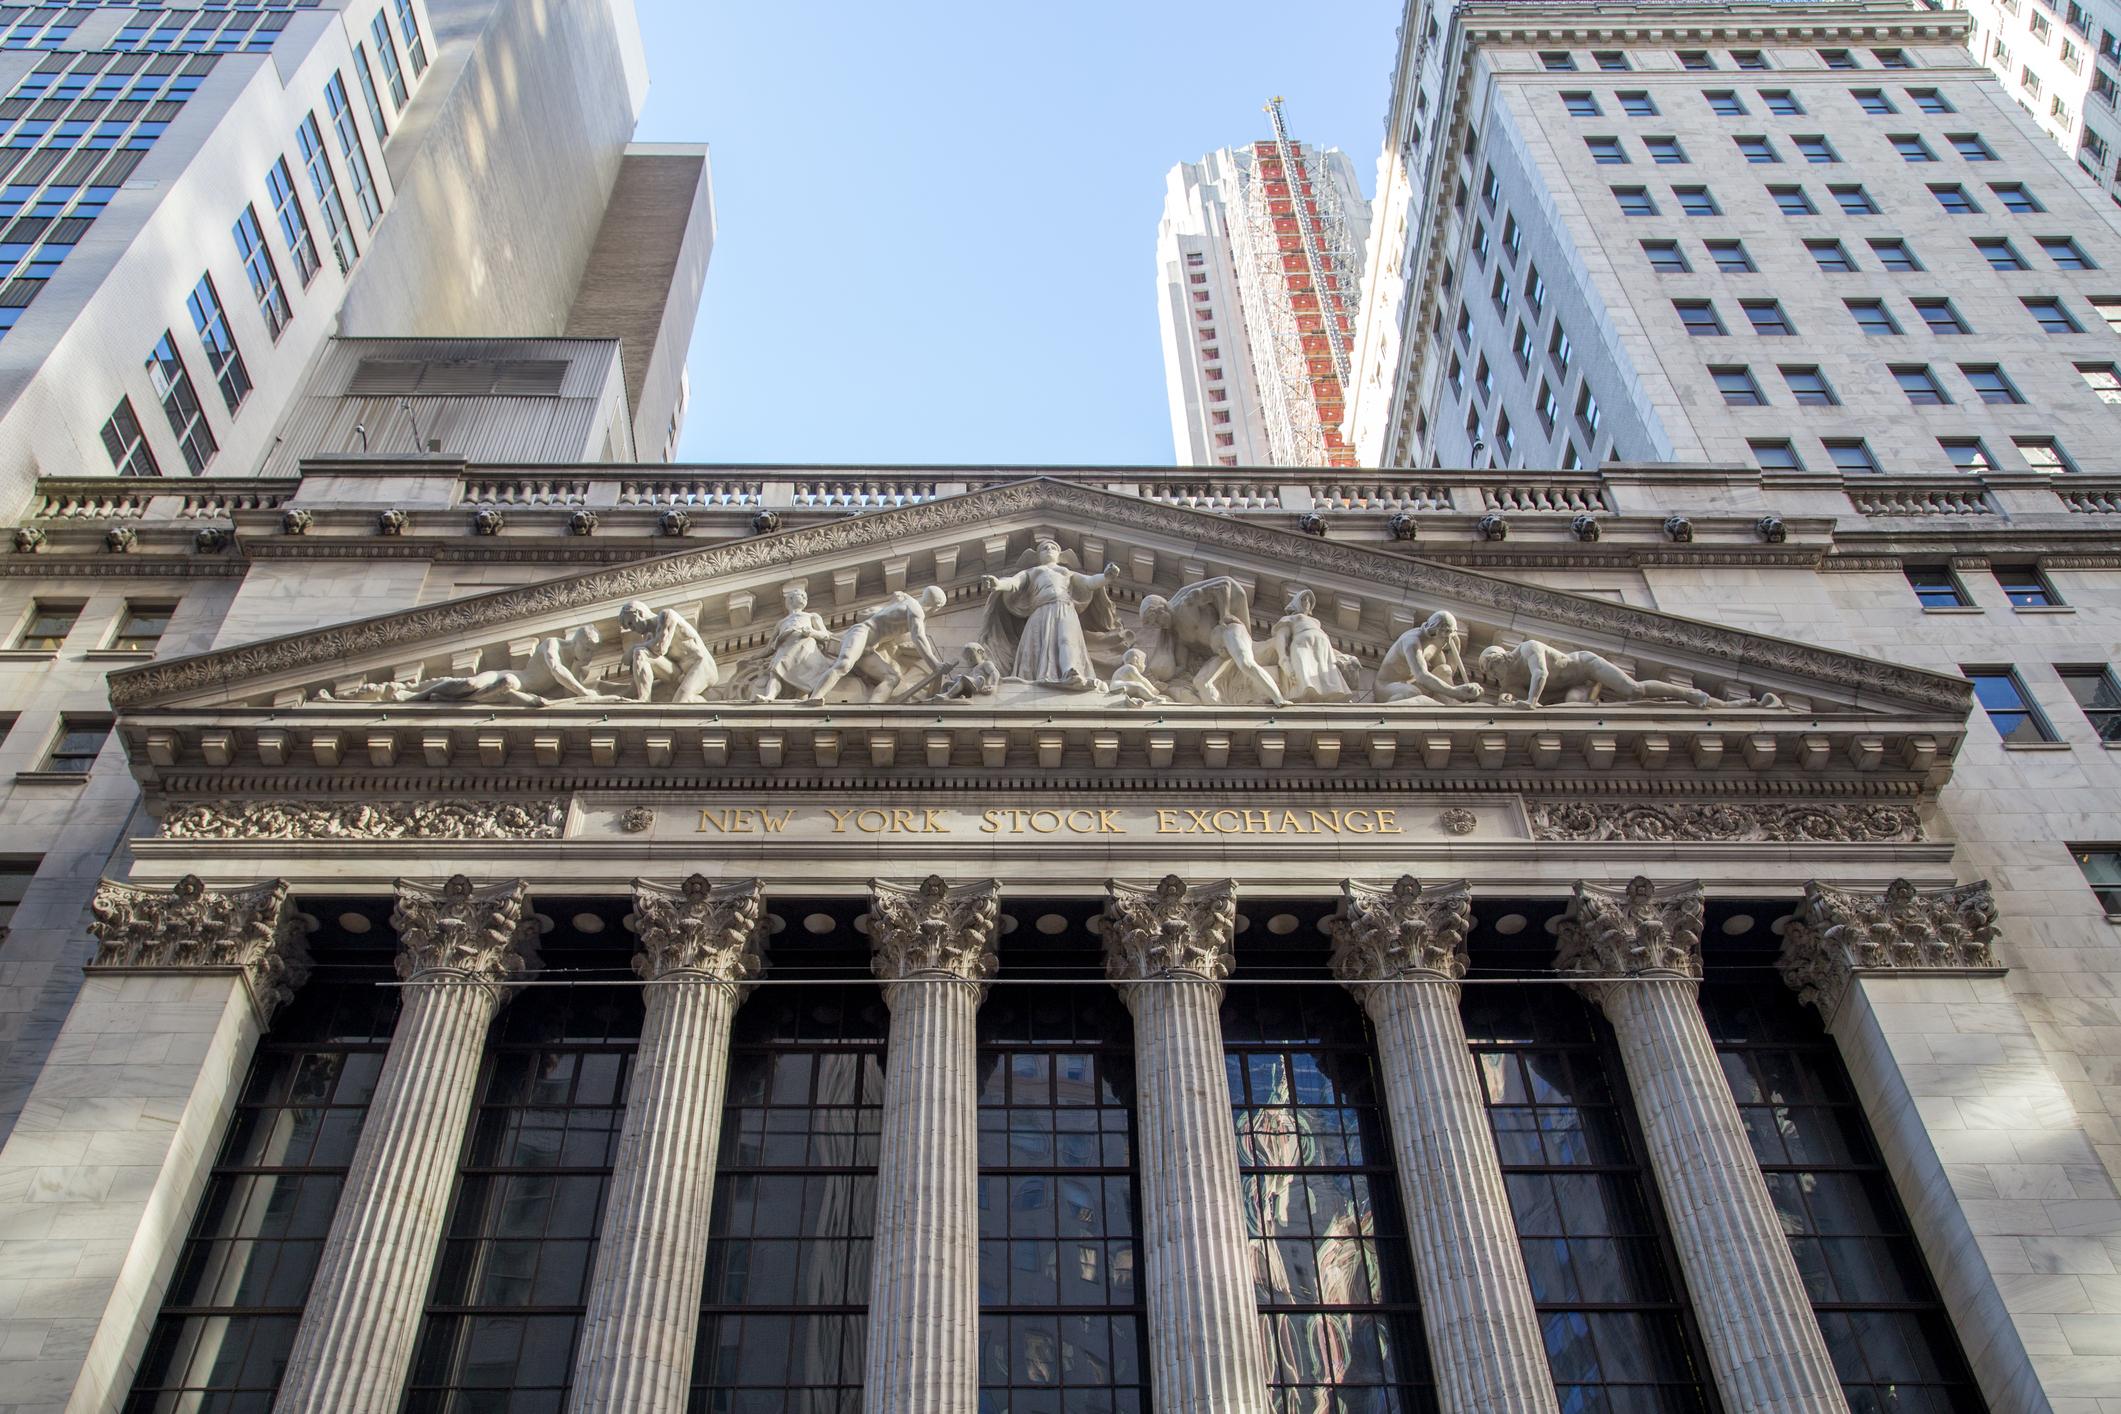 New York Stock Exchange facade